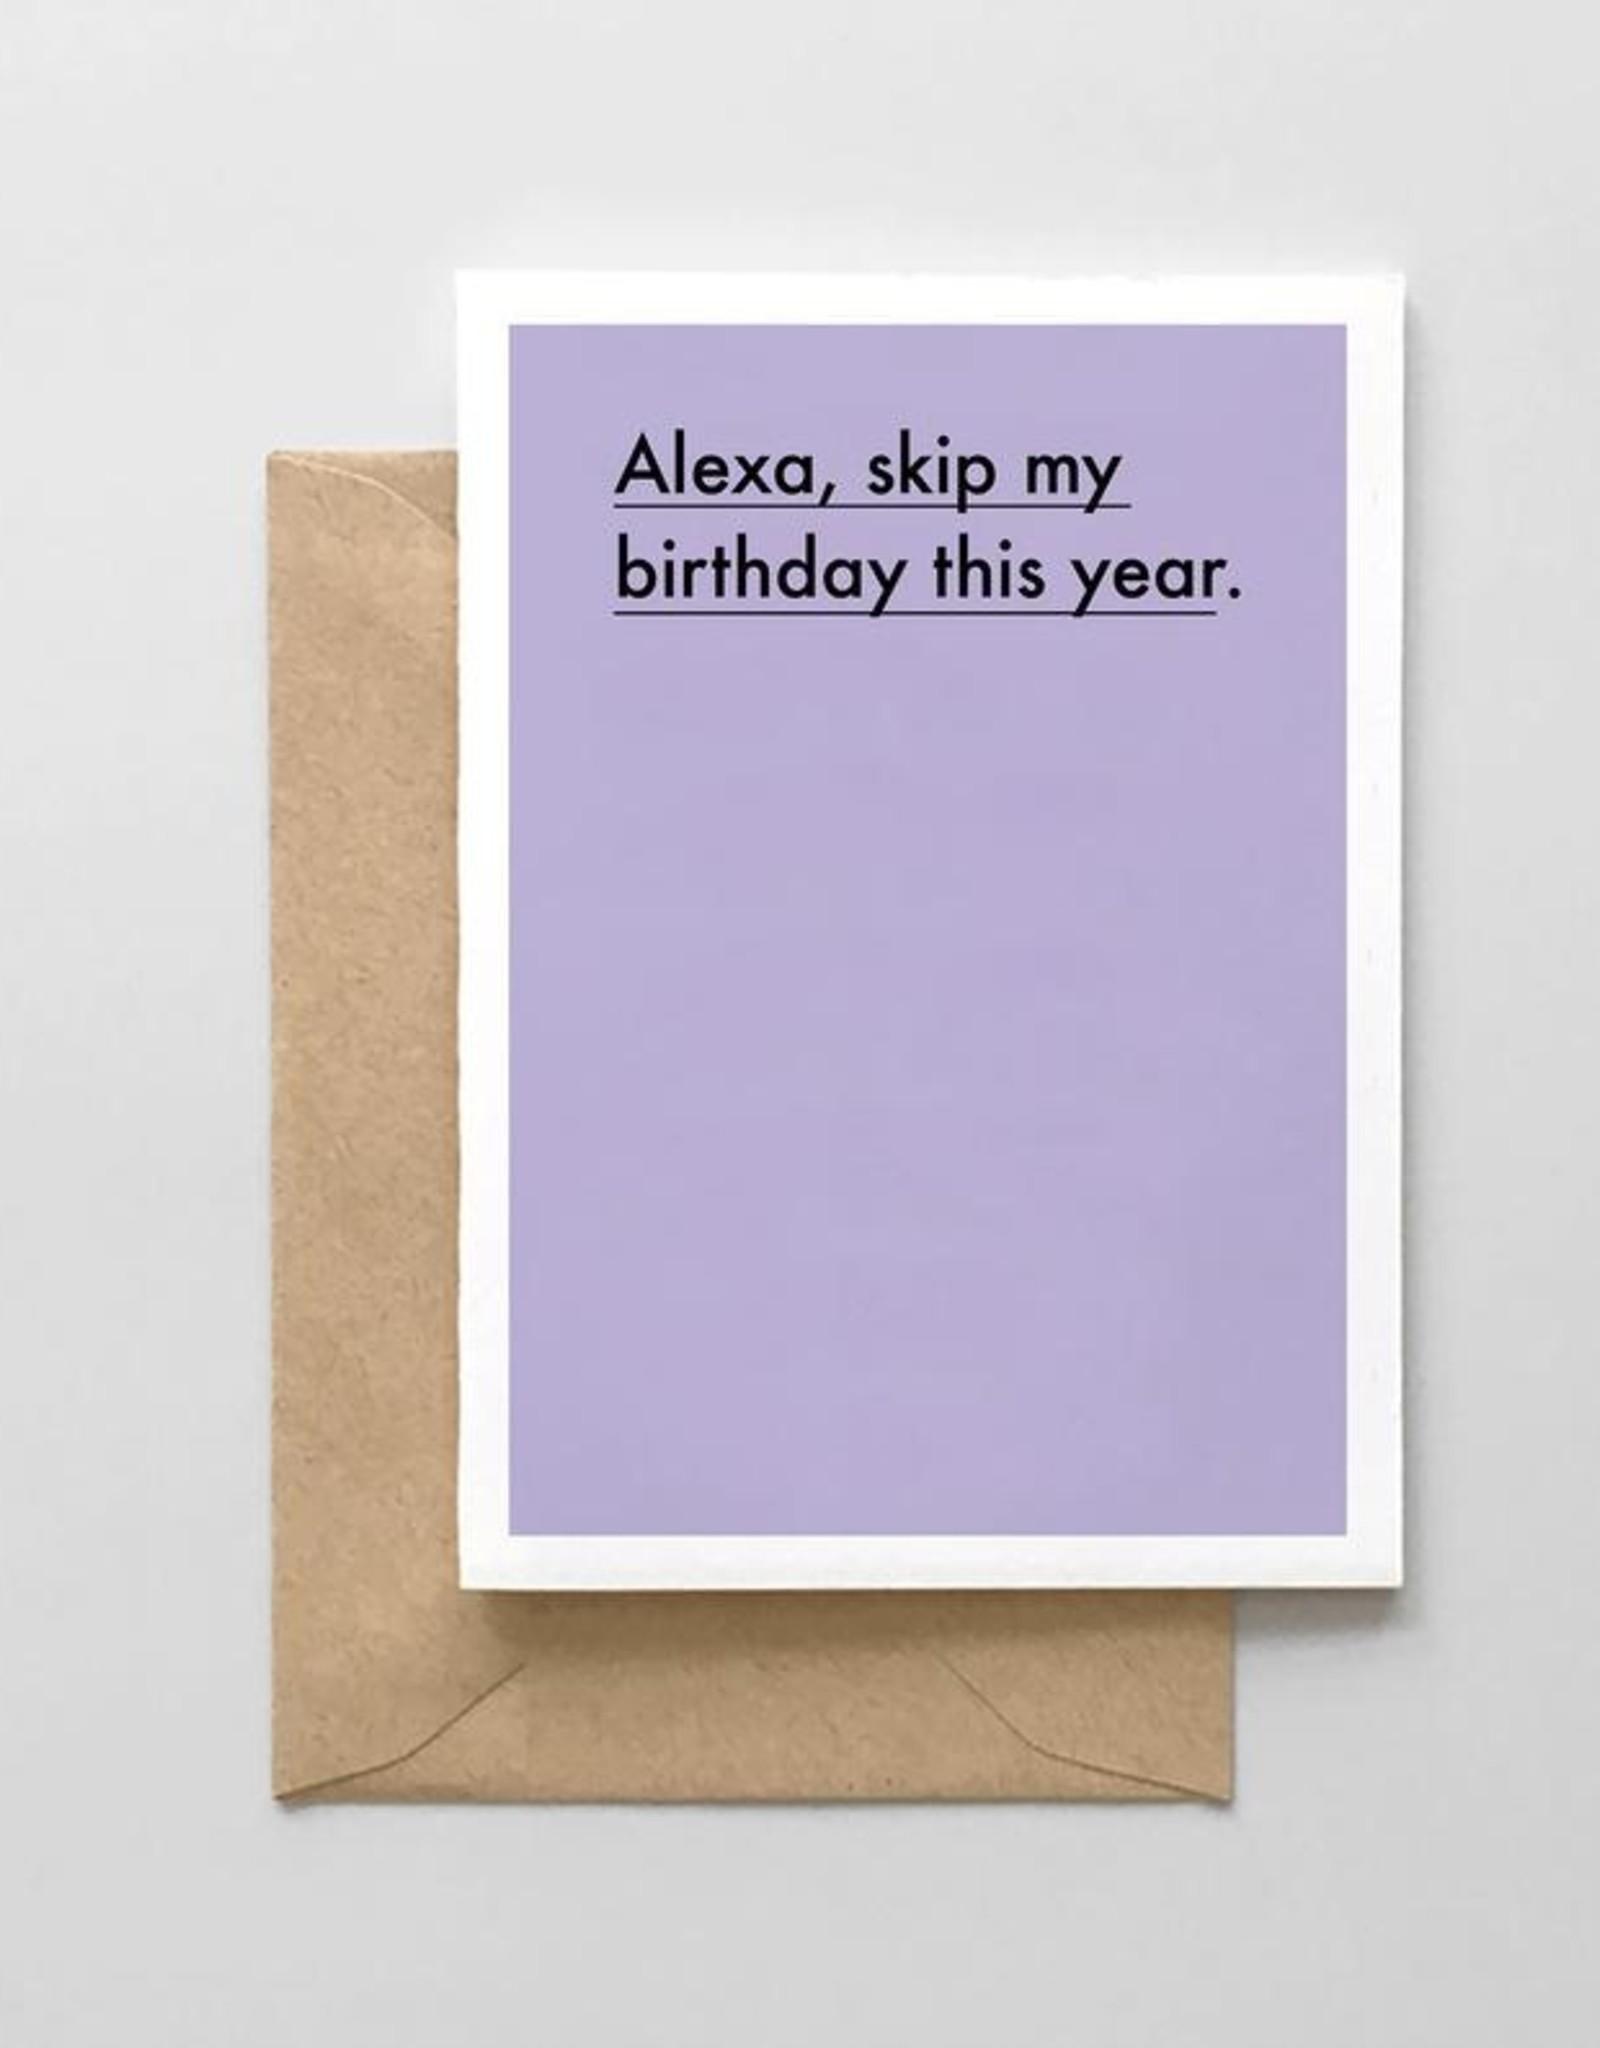 Spaghetti and Meatballs Card - Birthday: Alexa skip my birthday